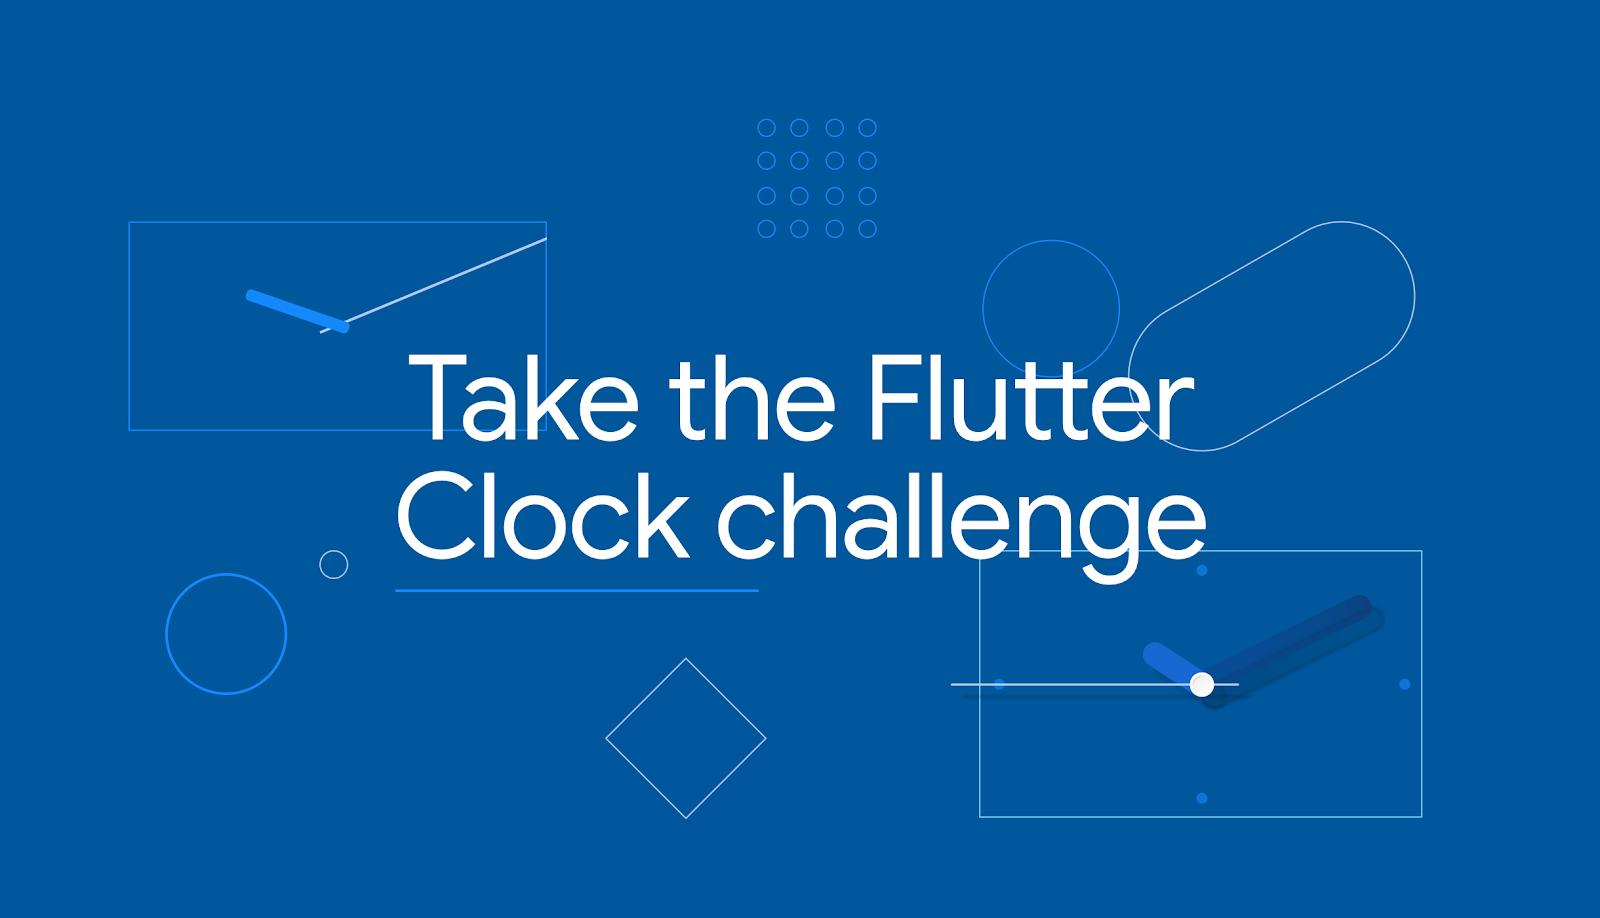 Take the Flutter Clock challenge banner